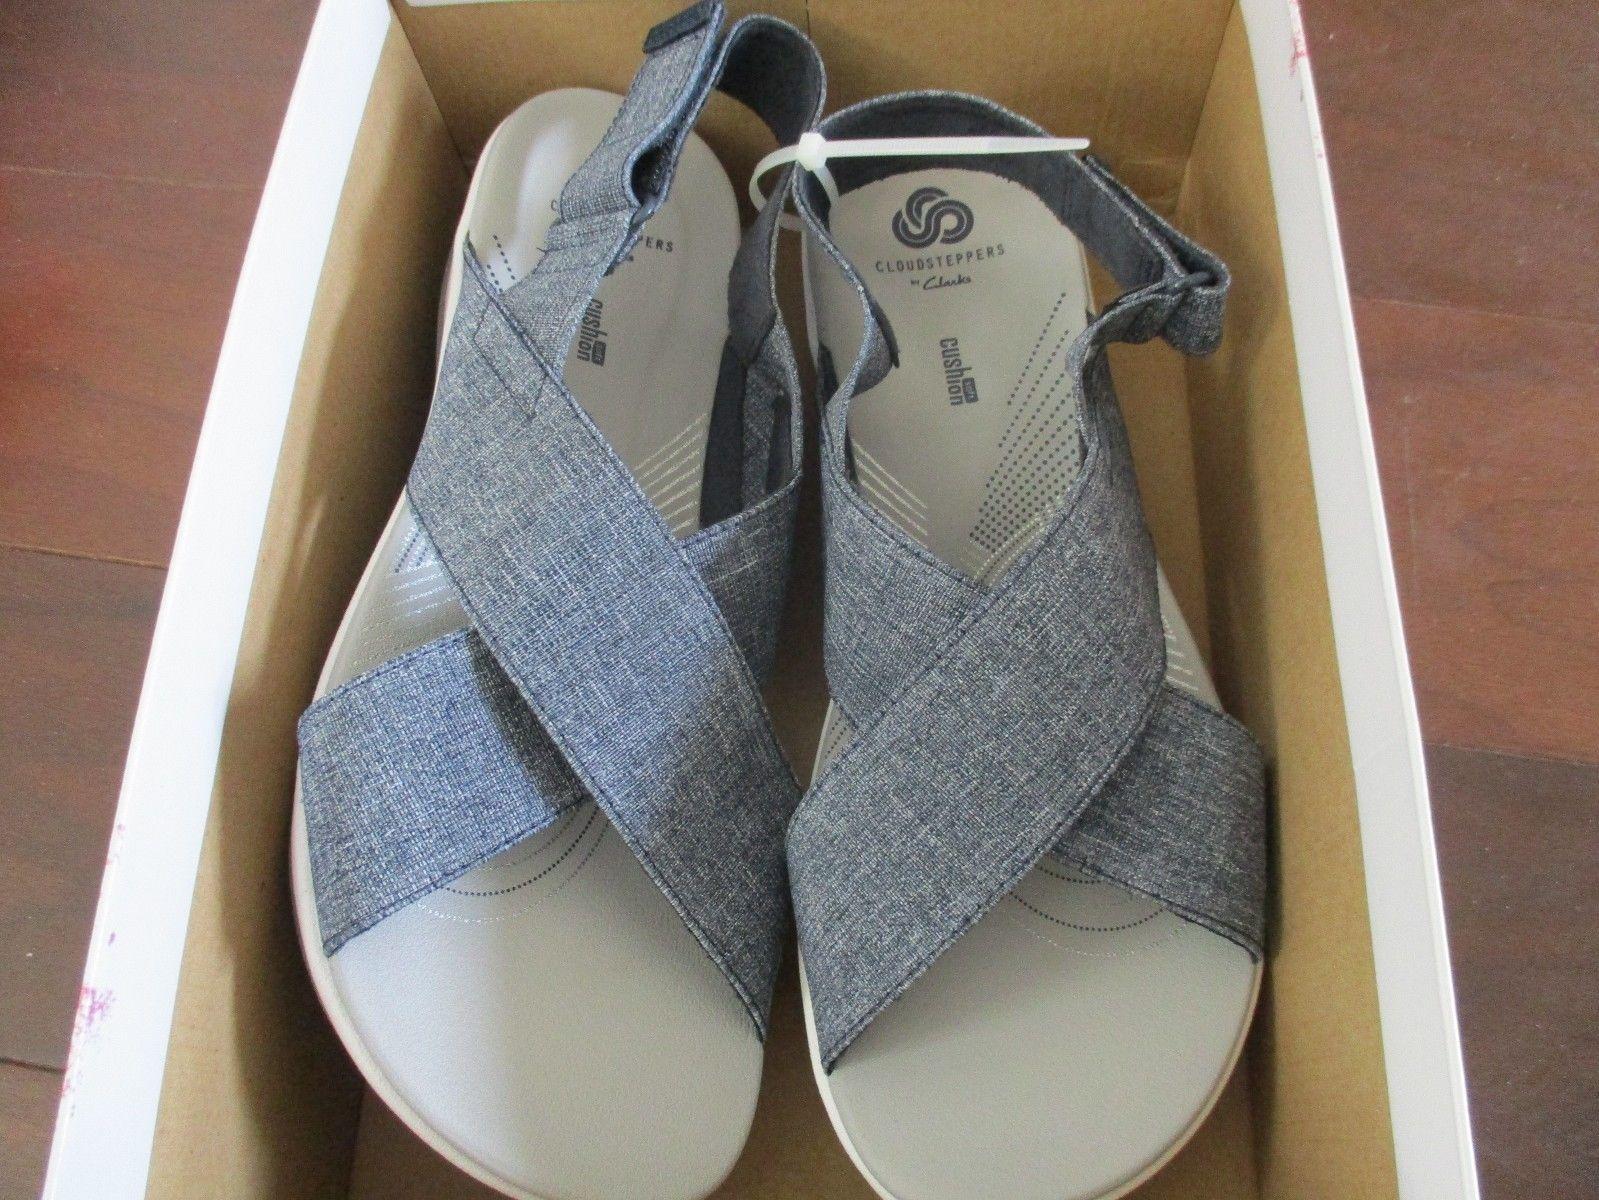 ee00a92eea3b S l1600. S l1600. Previous. BNIB Clarks Cloudsteppers Arla Kaydin Women s  Ortholite Sandals